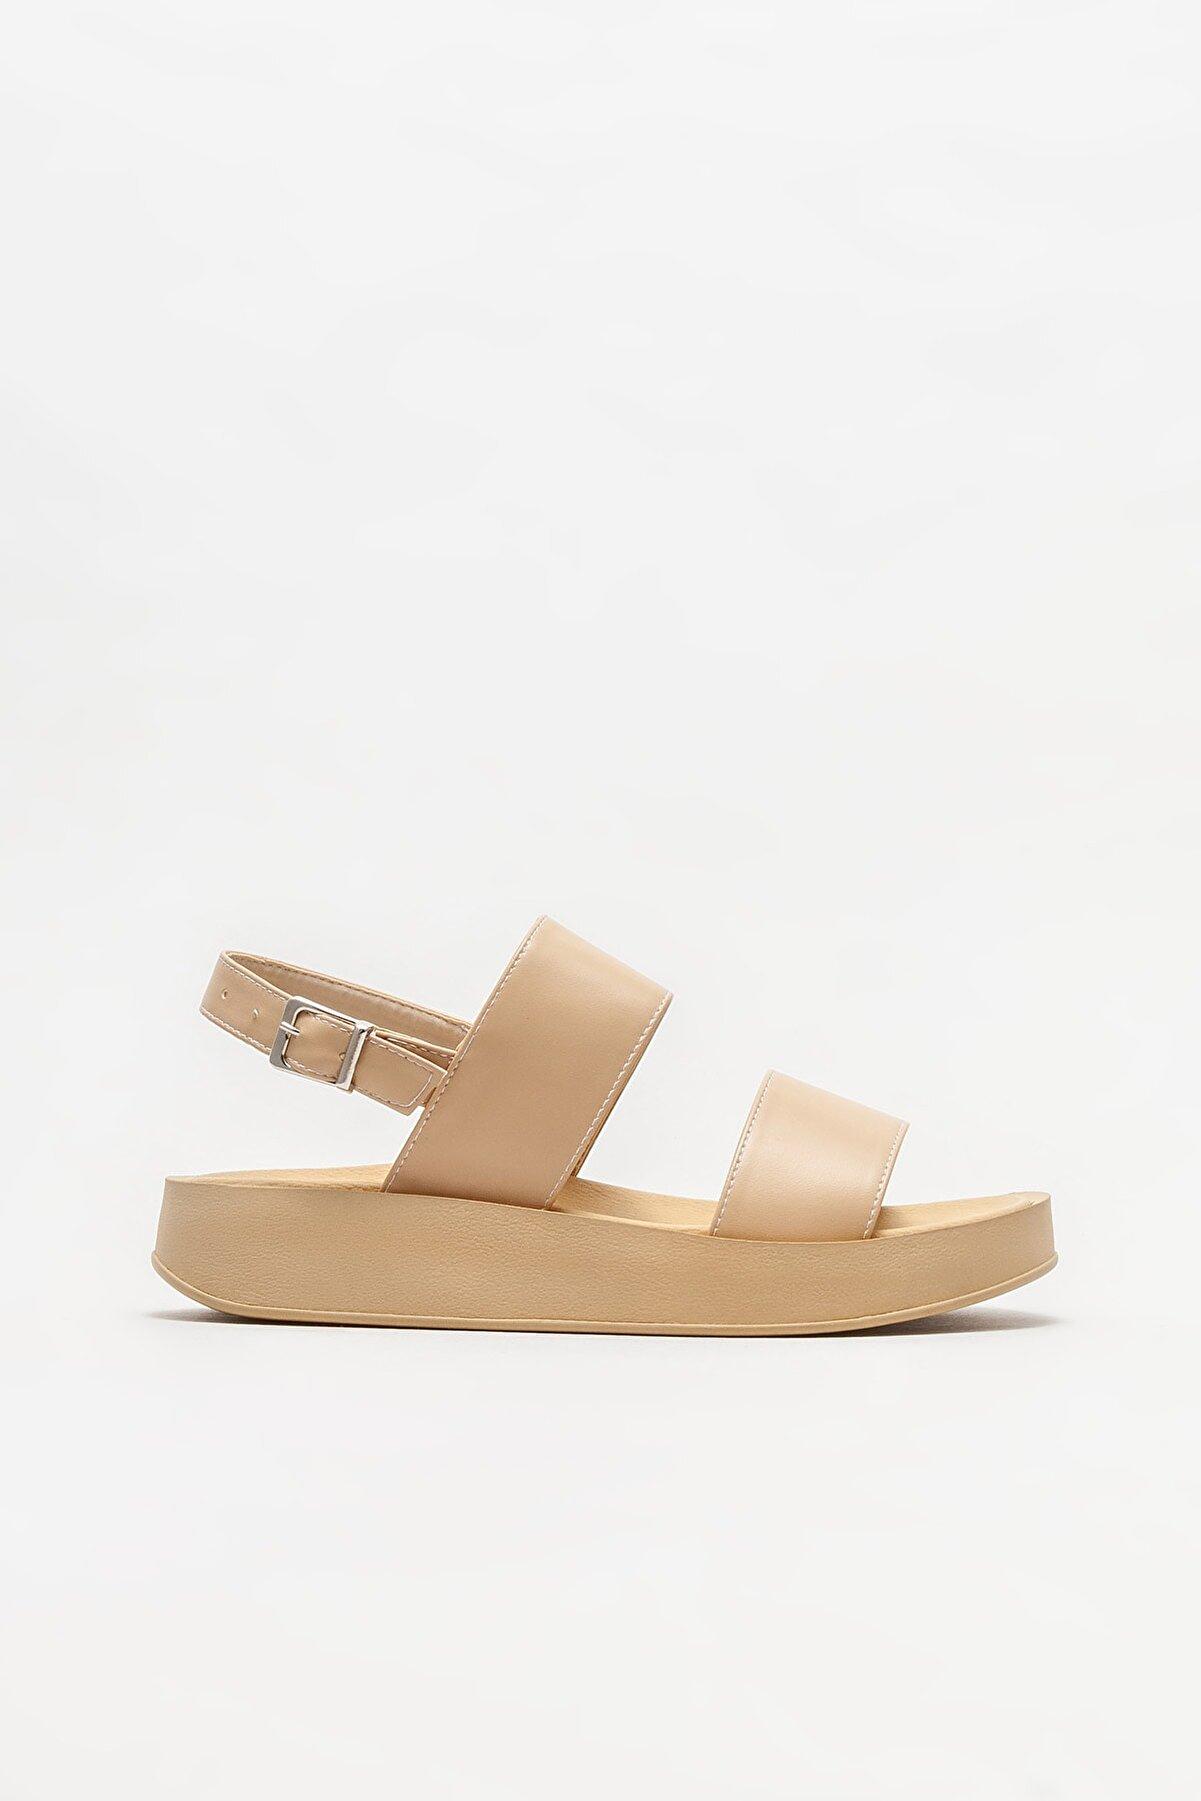 Elle Naturel Kadın Dolgu Topuklu Sandalet